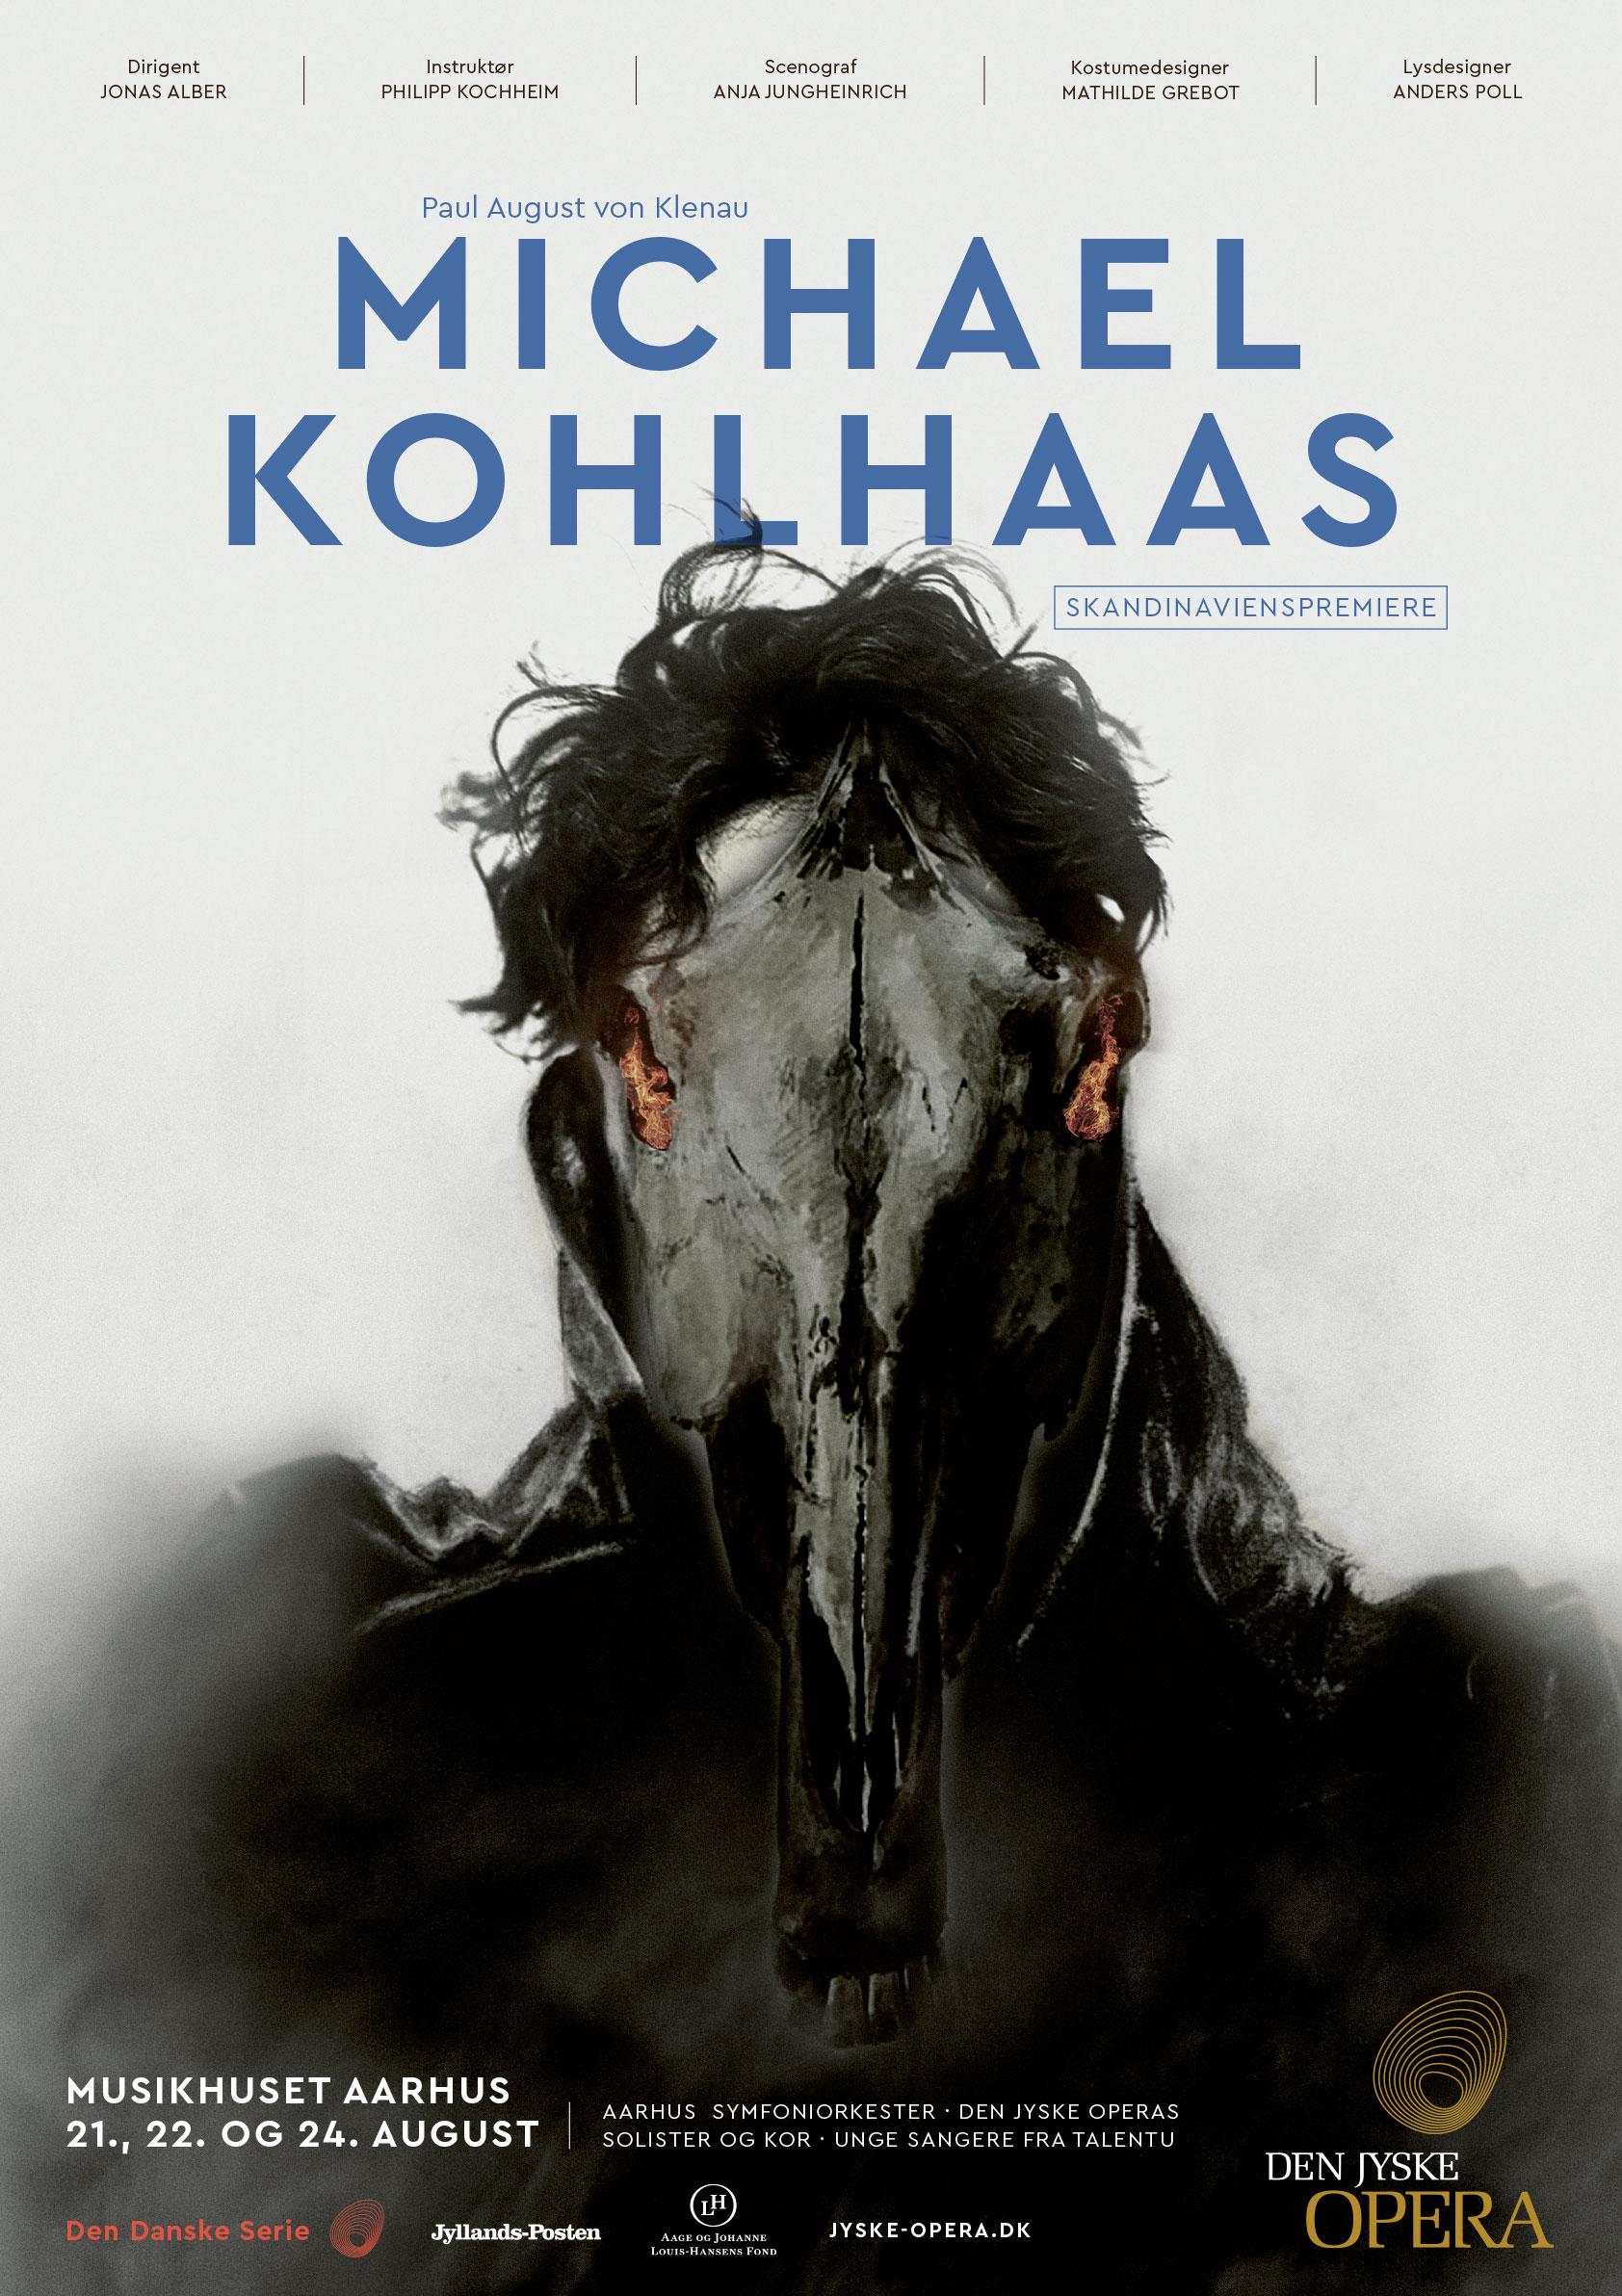 michaelkohlhaas_poster